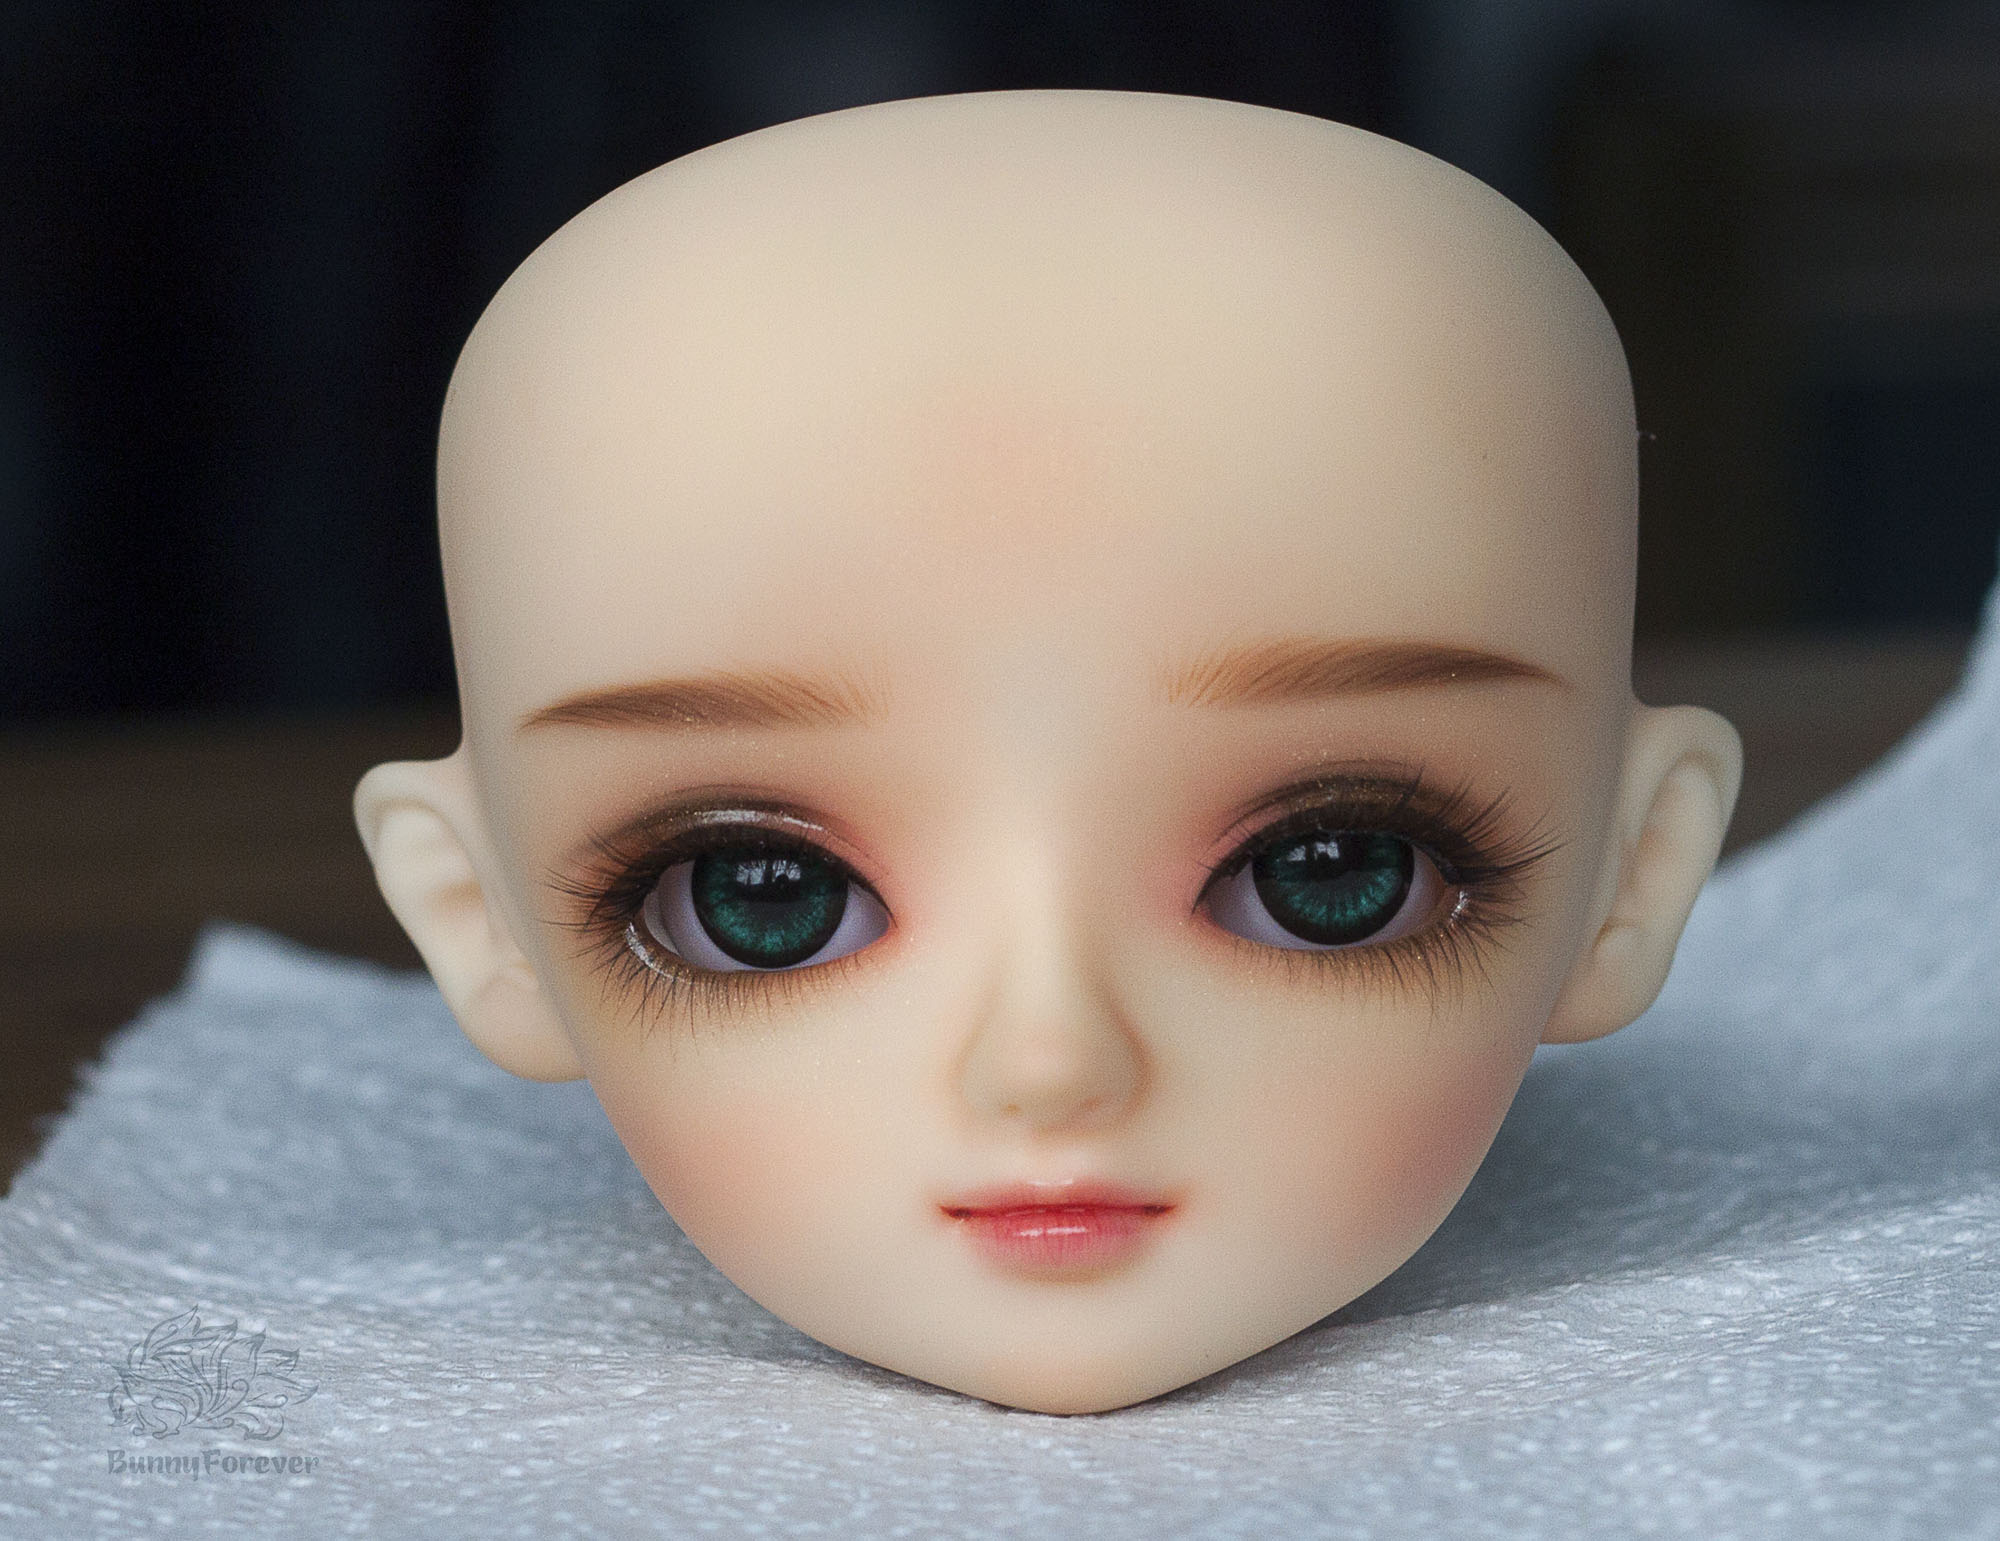 balljointeddoll, ball jointed doll, bjd, bjd doll, face-up, faceup, face-up bjd, faceup bjd, faceup commission, face-up commission, búp bê bjd, bjddoll, balljointdoll, volks sd10 rose, faceup artist, canada face-up artist